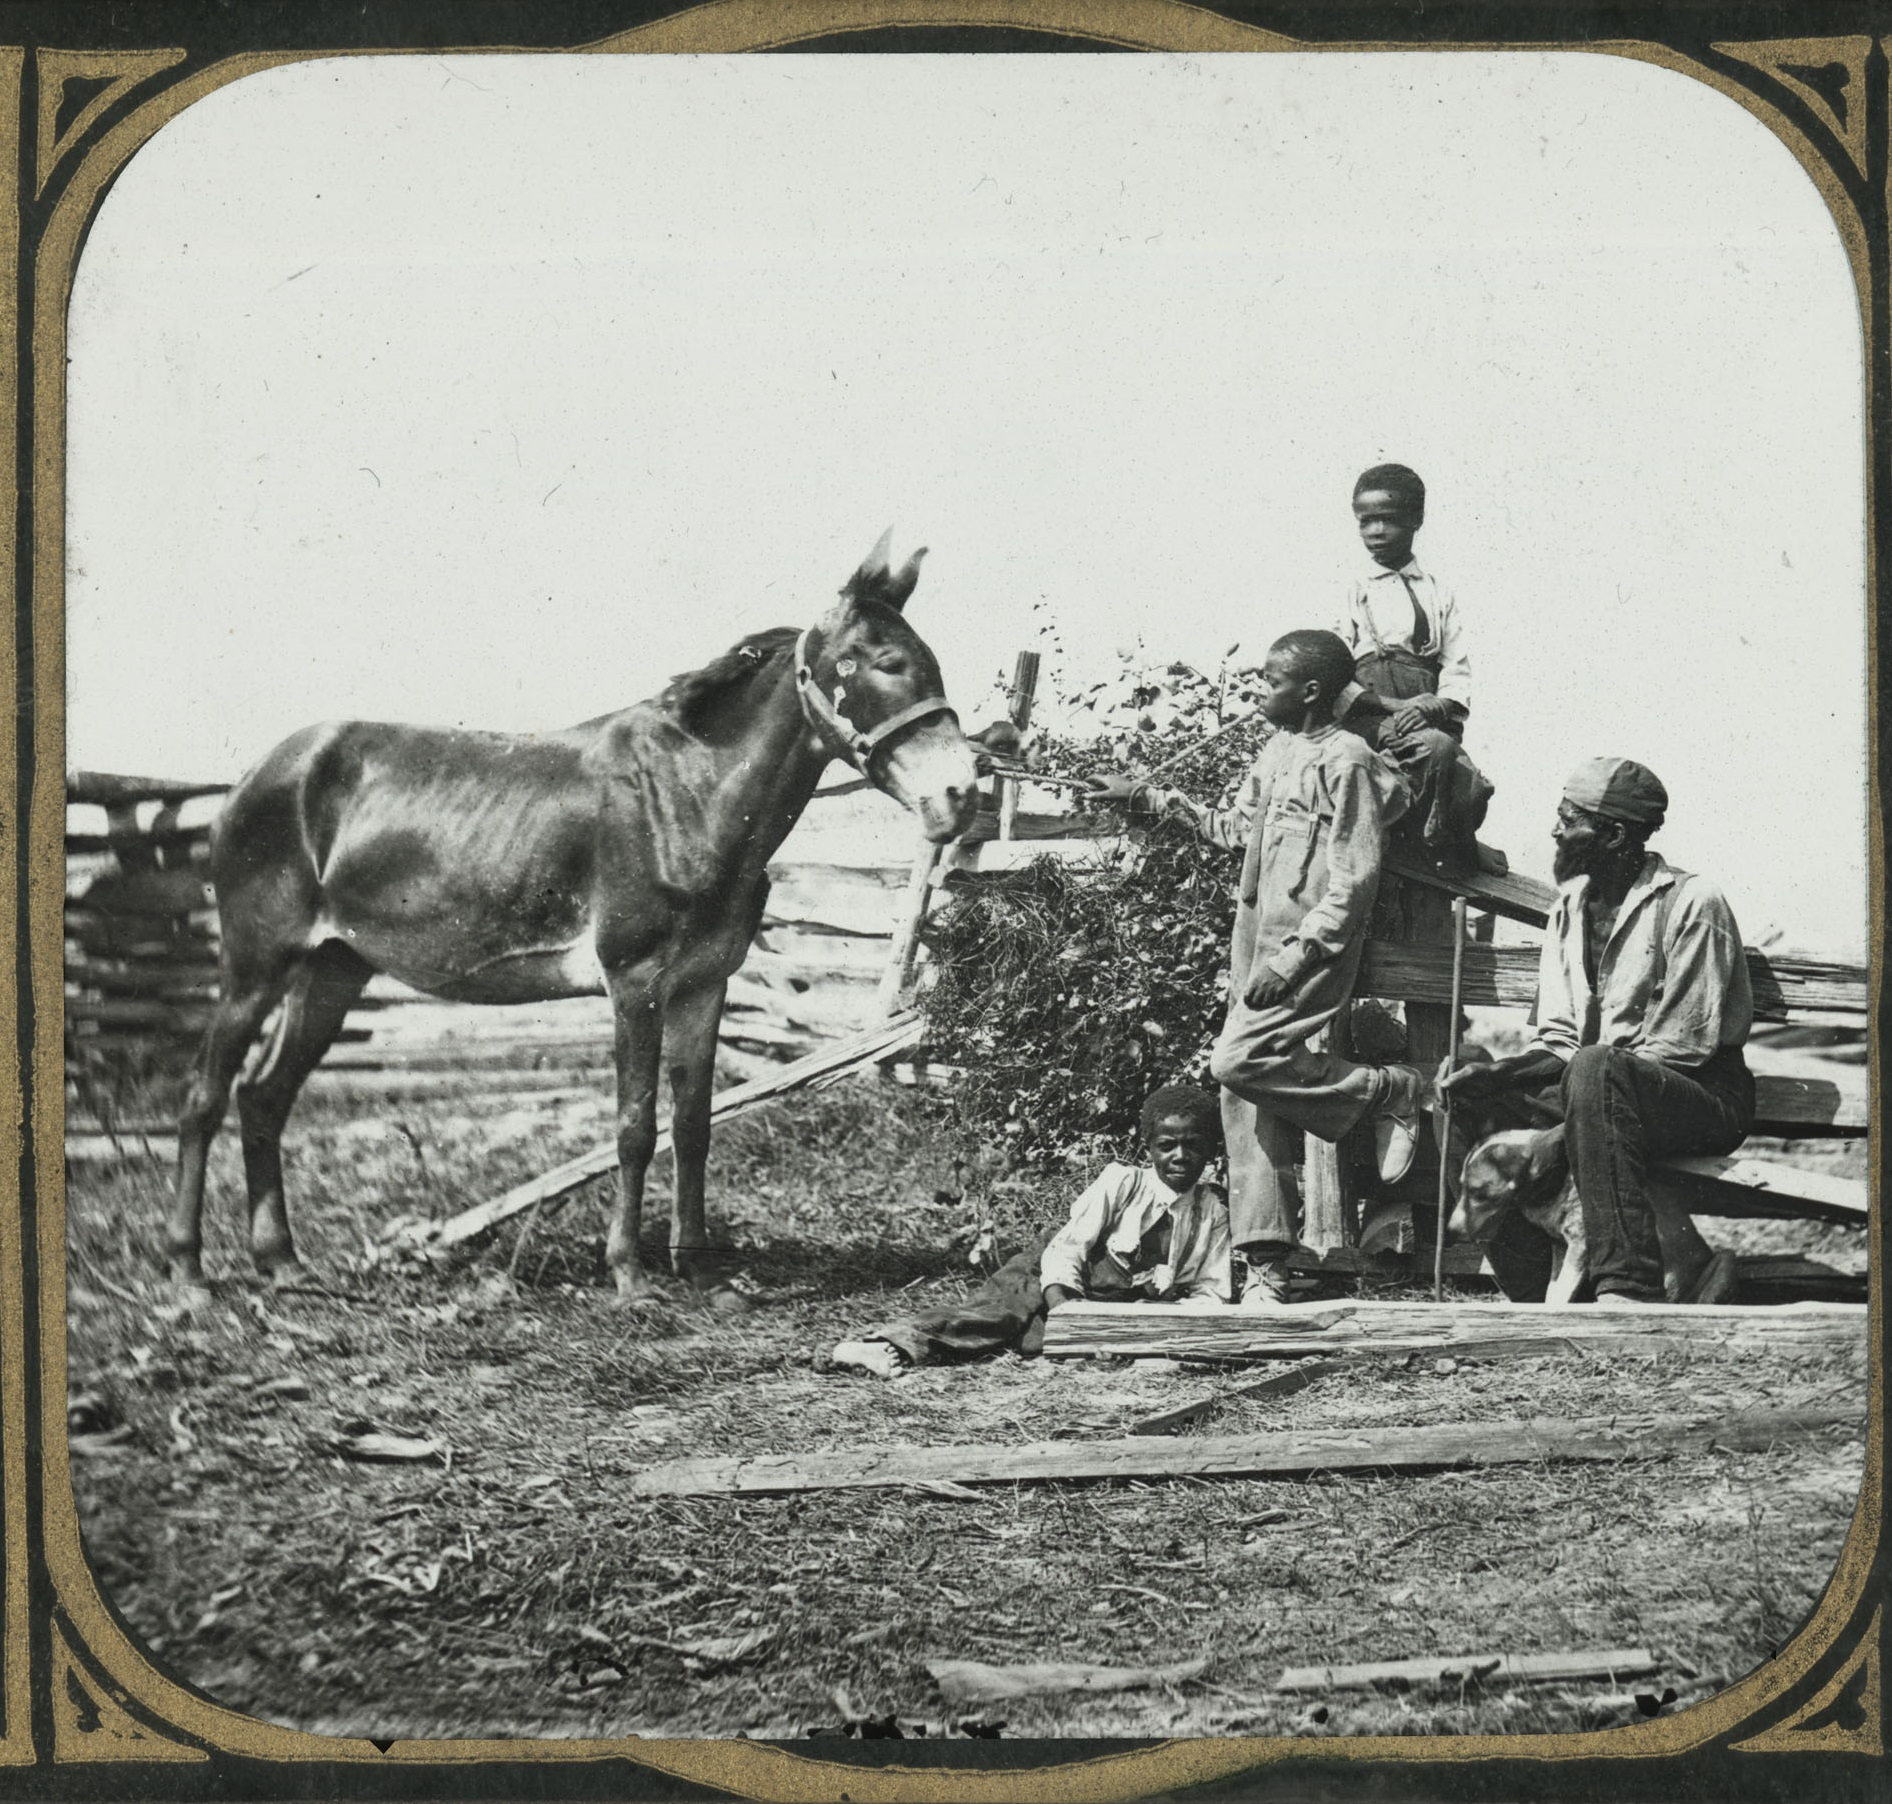 Lantern slide of three enslaved African American boys and an enslaved African American man.